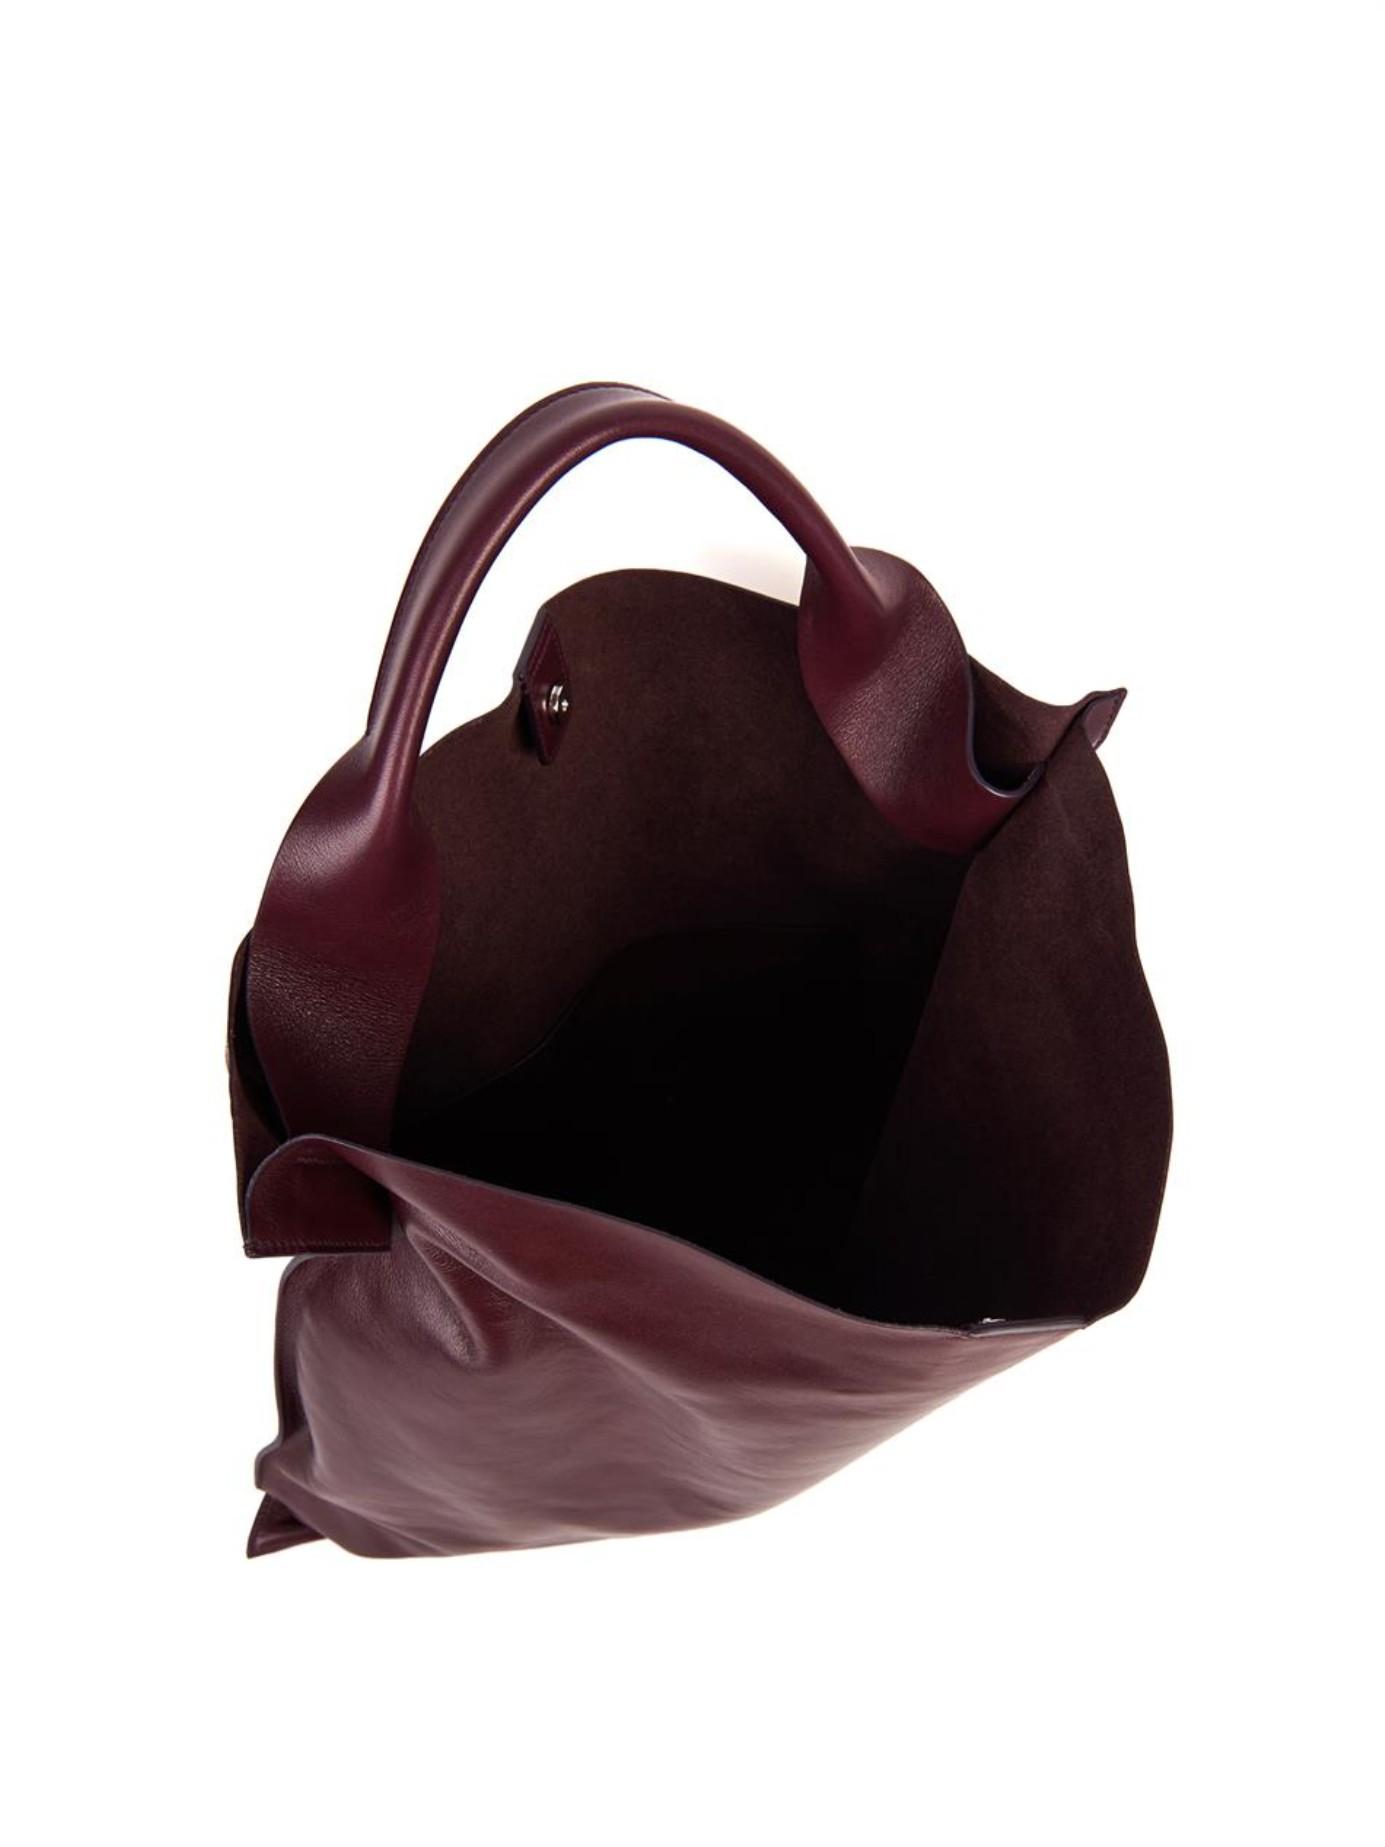 e06fc6fb88b37 Lyst - Jil Sander Xiao Leather Tote in Purple